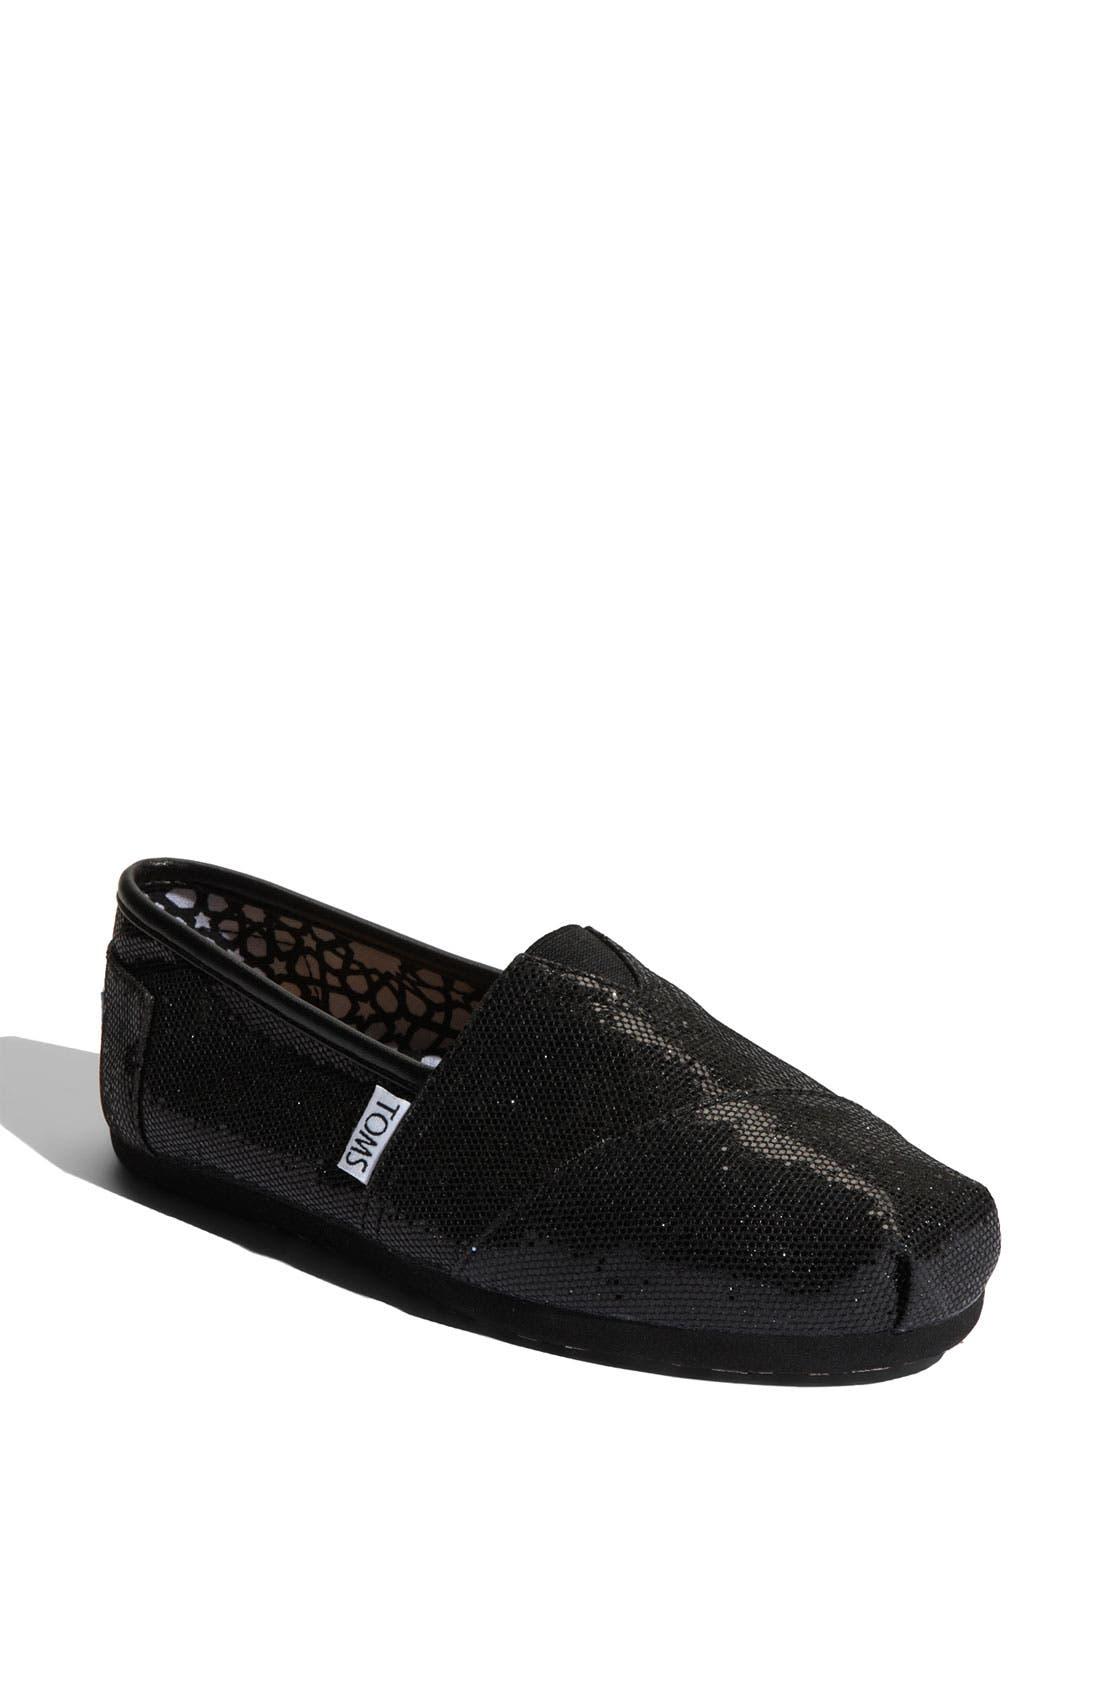 toms shimmer shoes